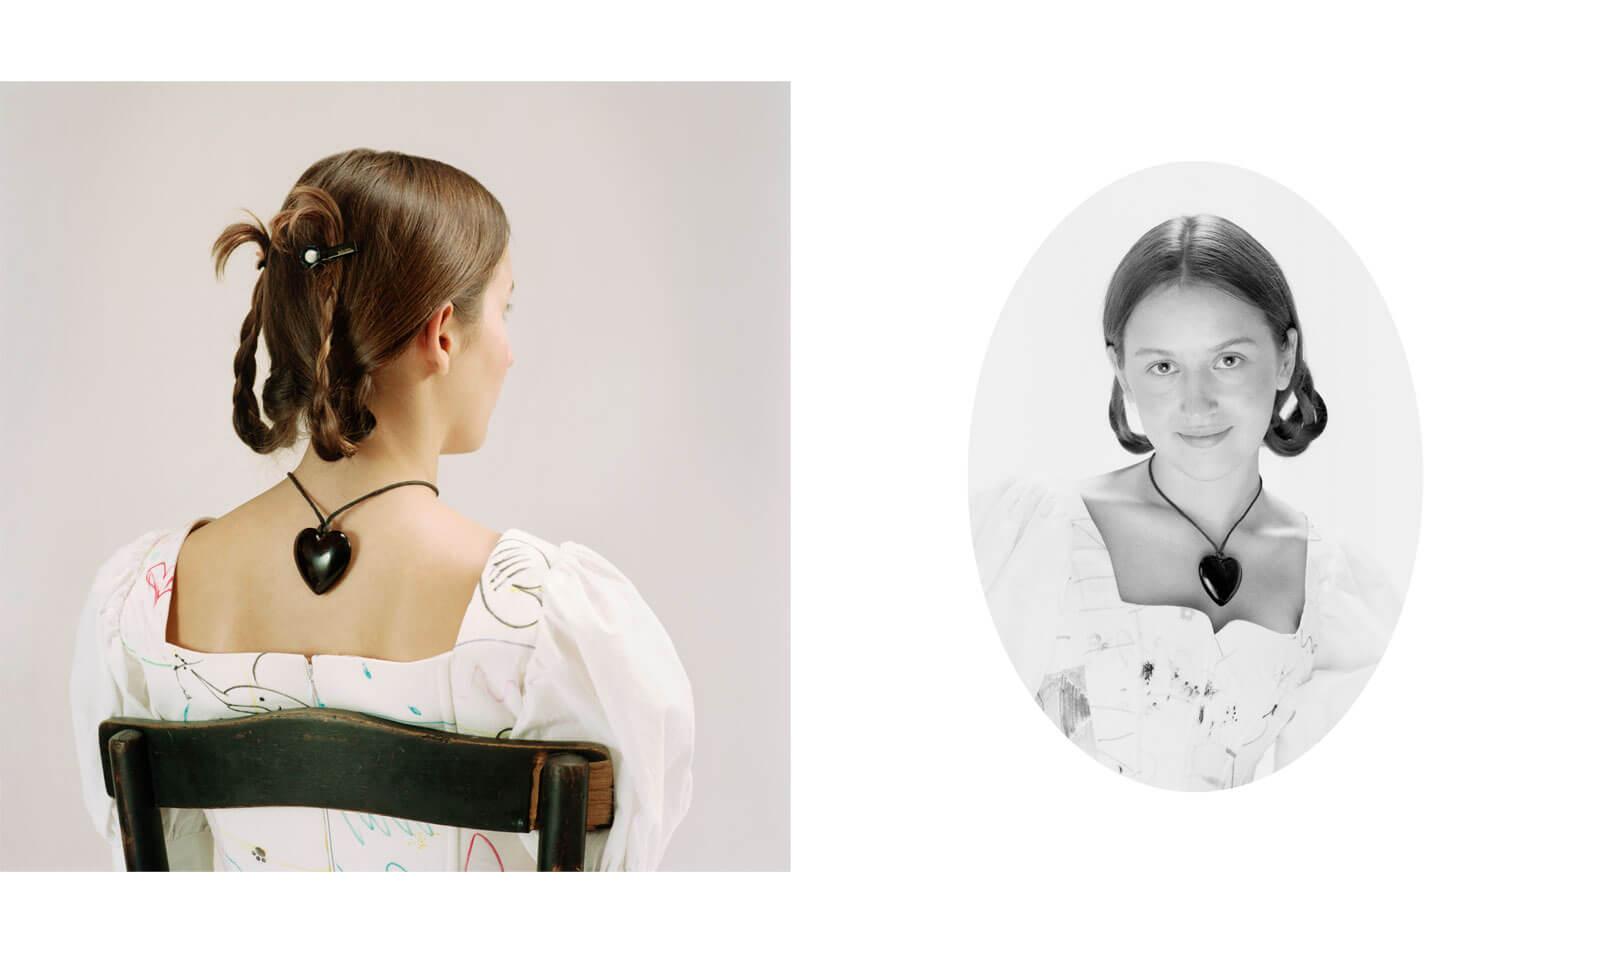 Encounter|Carnation Studio & Veronica Nojac